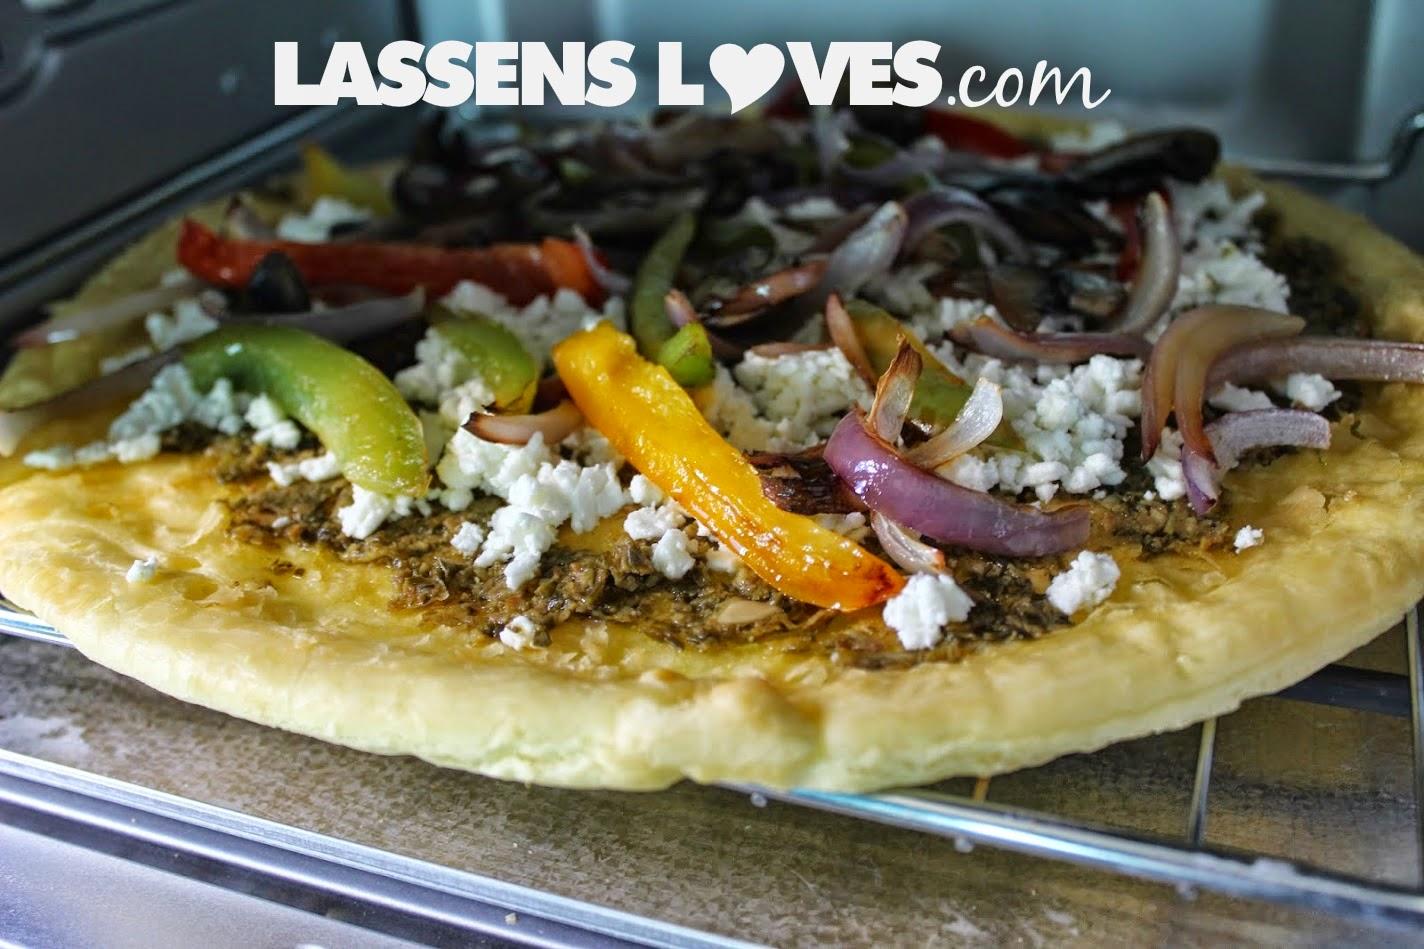 veggie+pizza, pesto+pizza, gluten+free+pizza, greens+pizza, guilt+free+pizza